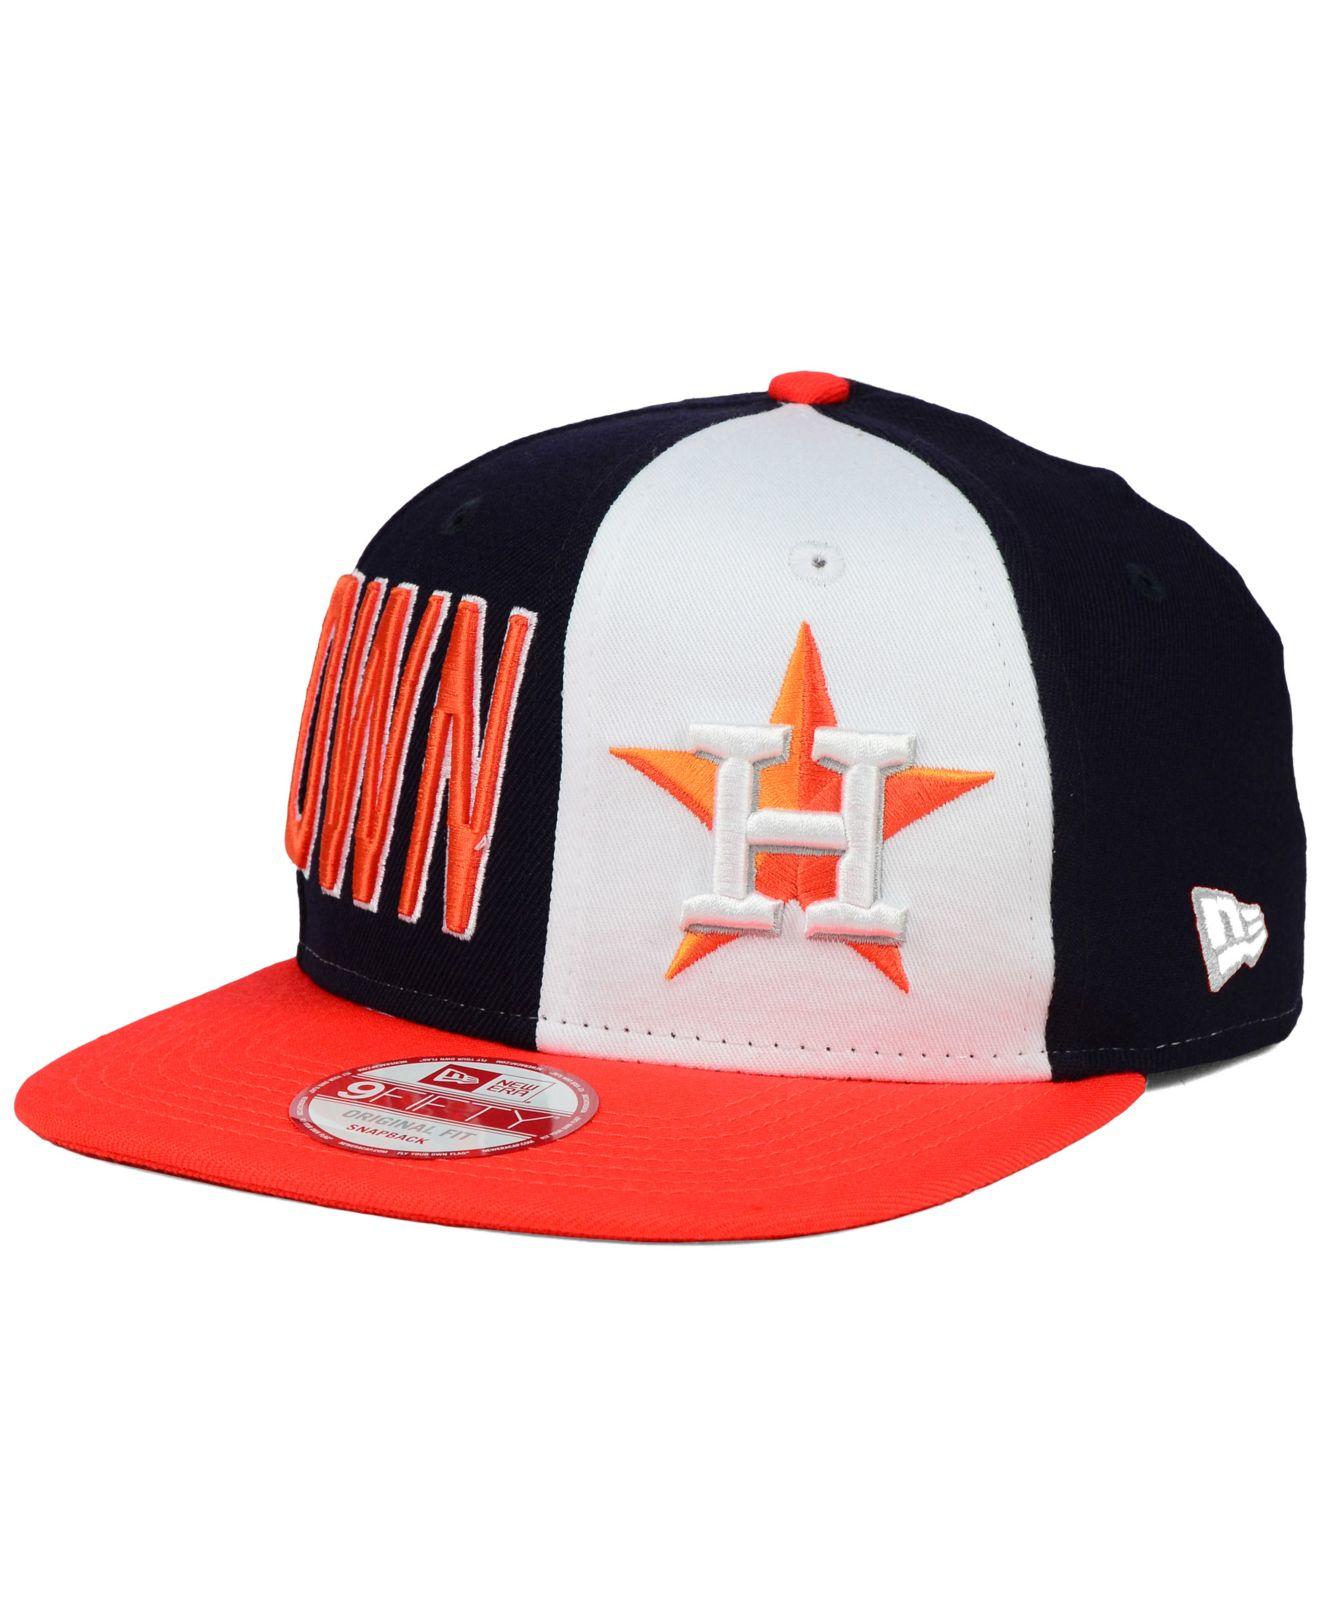 best website b3ed8 9f9b9 Lyst - KTZ Houston Astros My Block 9fifty Snapback Cap in Blue for Men